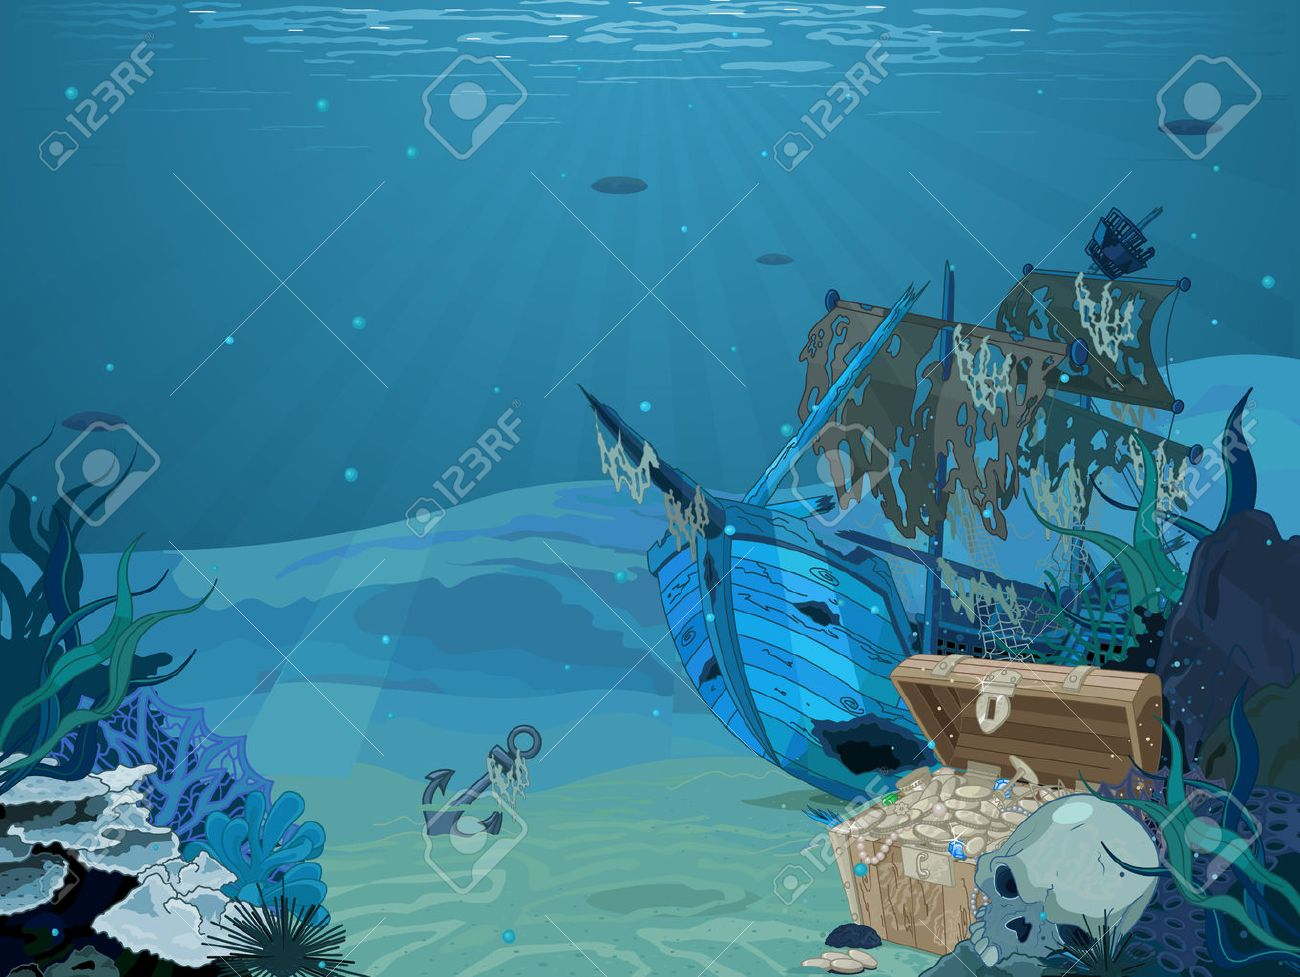 Illustration Of Sunken Sailboat On Seabed Background Royalty 1300x977